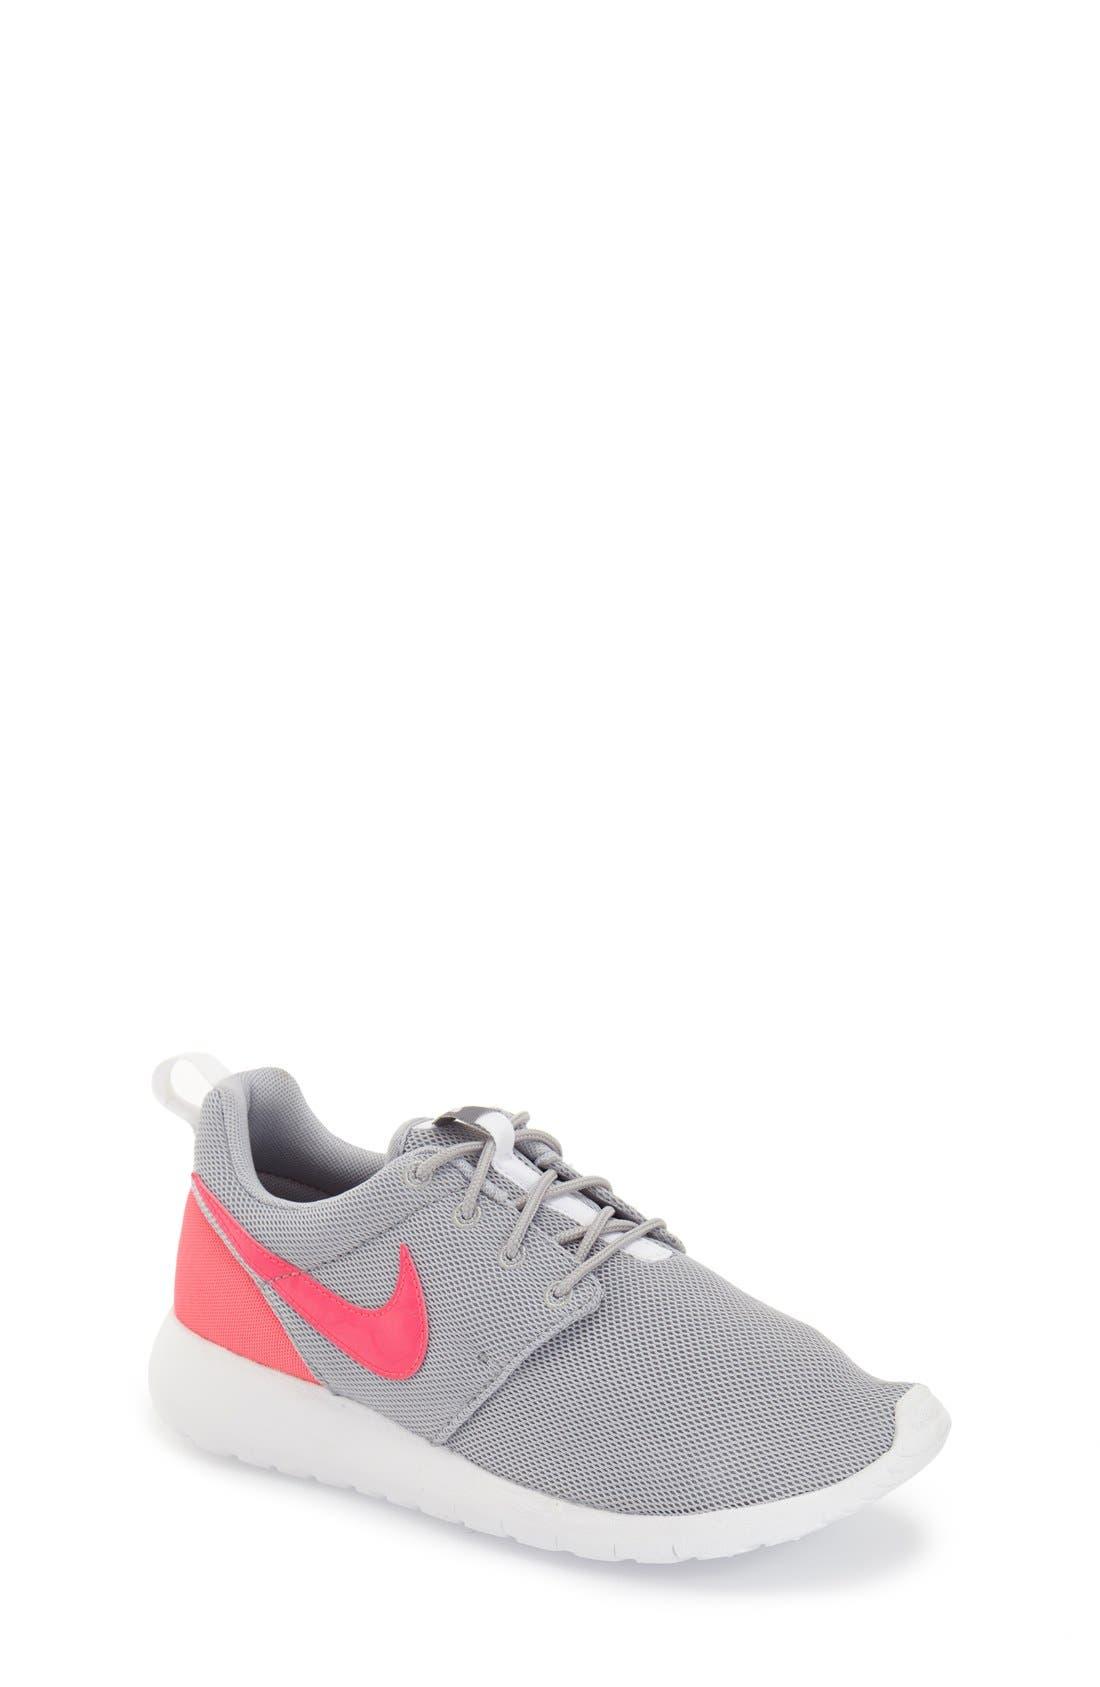 'Roshe Run' Athletic Shoe,                             Main thumbnail 23, color,